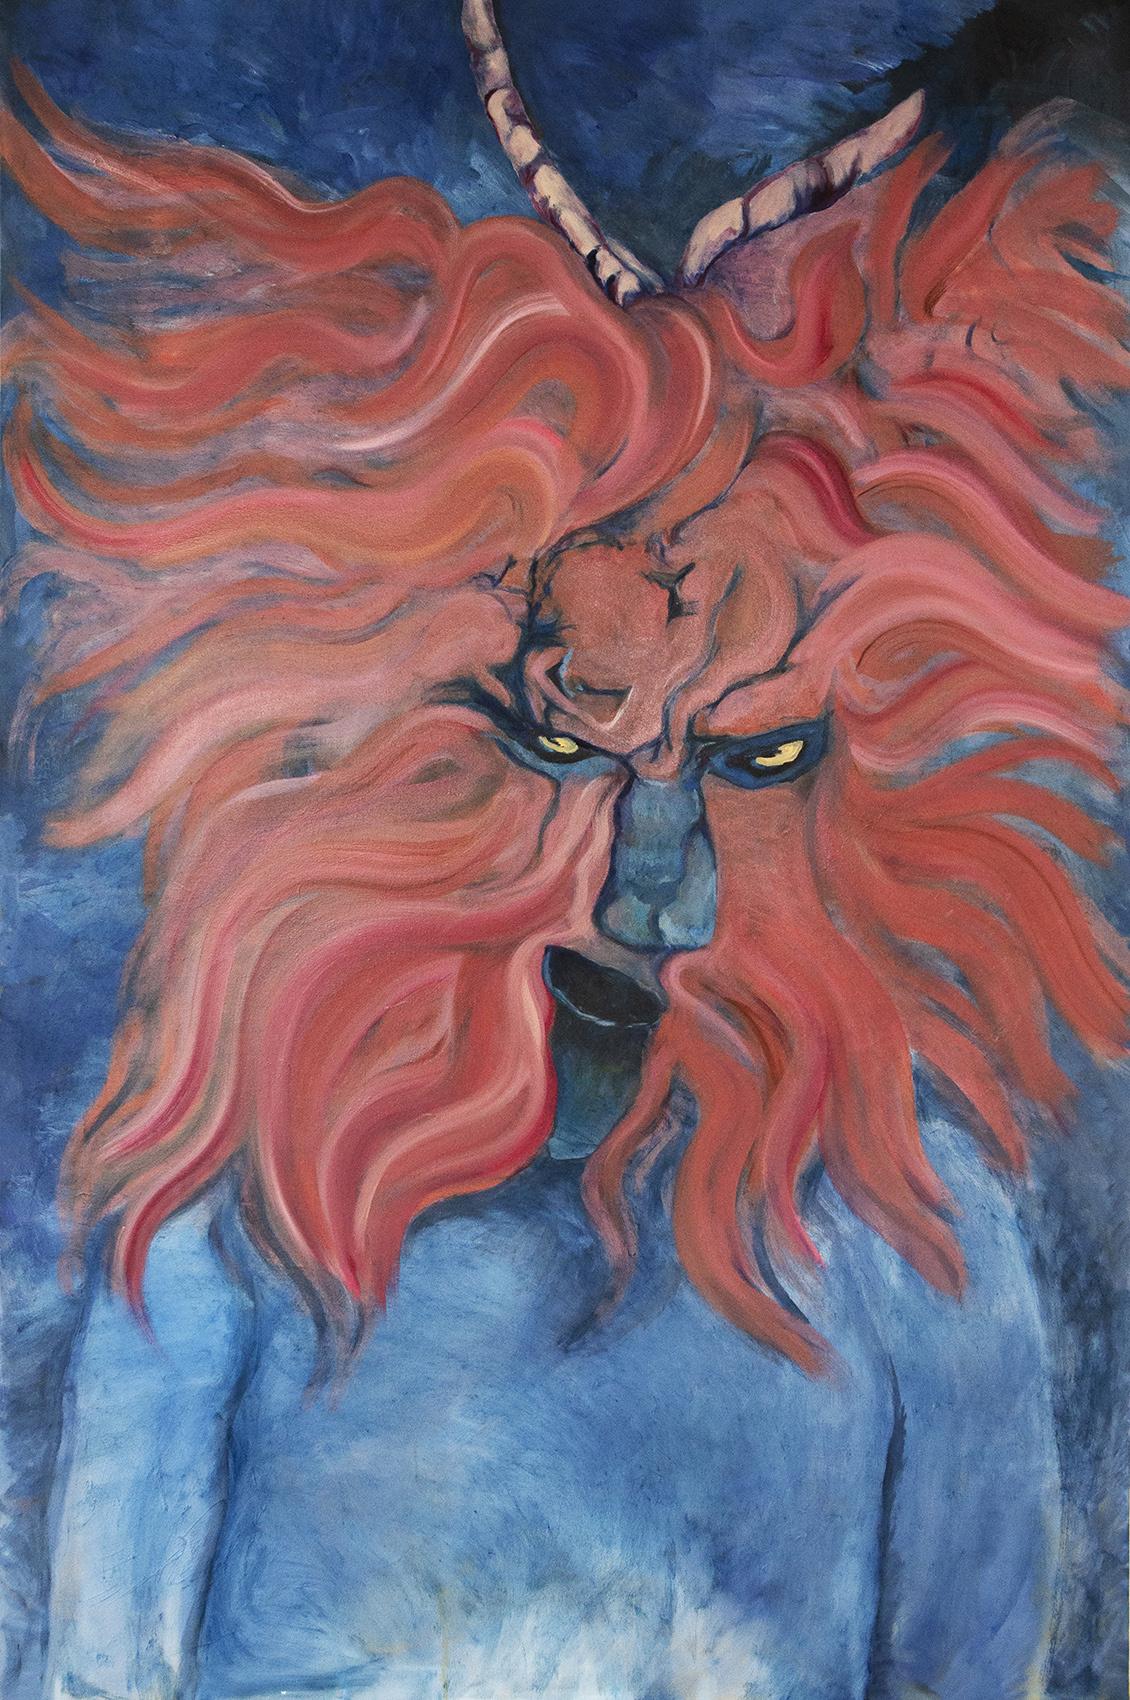 Ria Kacharava 9 #art живопись, искусство, Нью-Йорк, Риа Качарава, сша